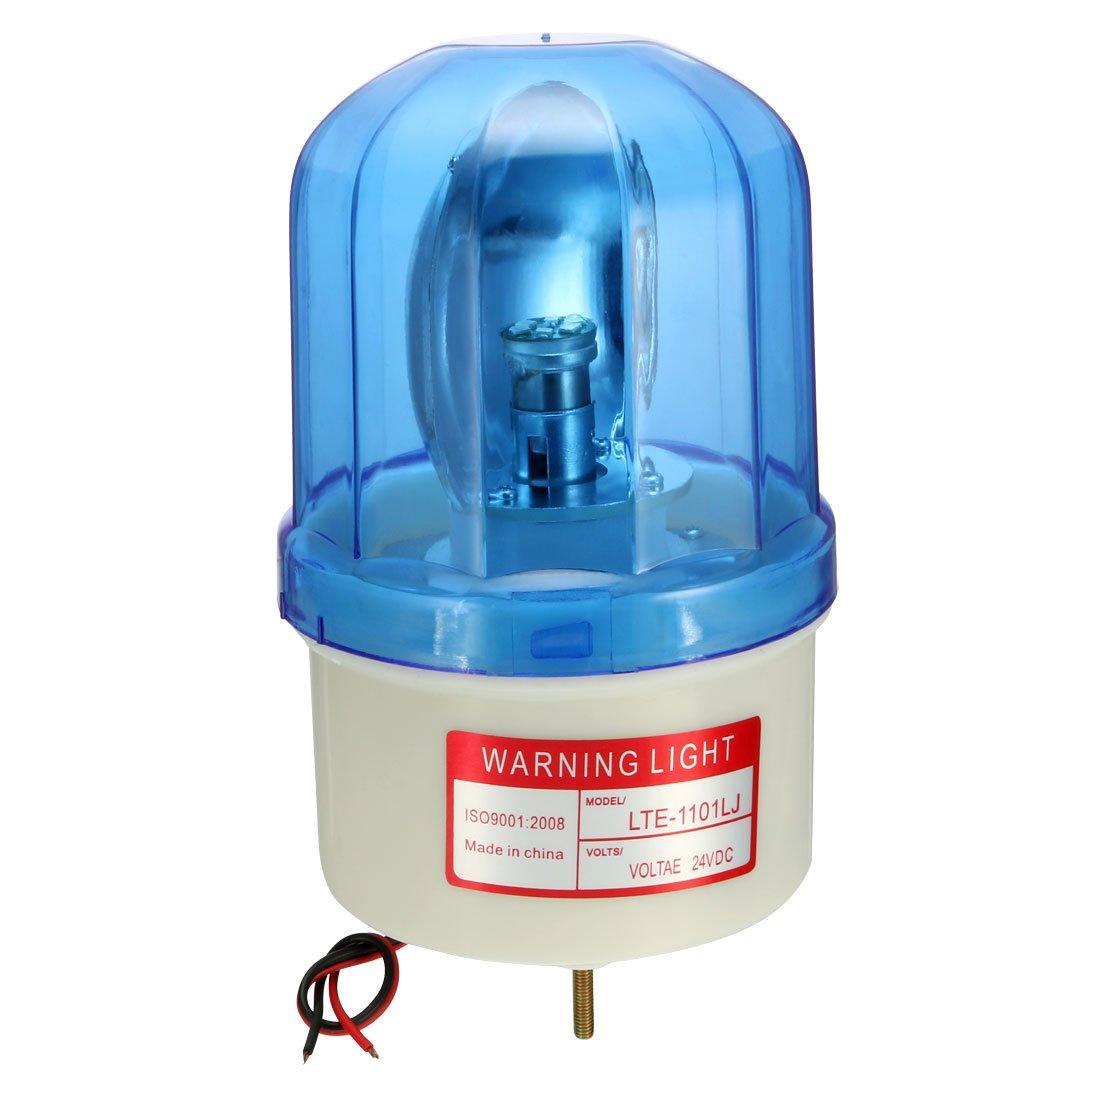 uxcell LED Warning Light Bulb Rotating Flashing Signal Alarm Lamp Buzzer 90dB DC 24V Blue LTE1101LJ